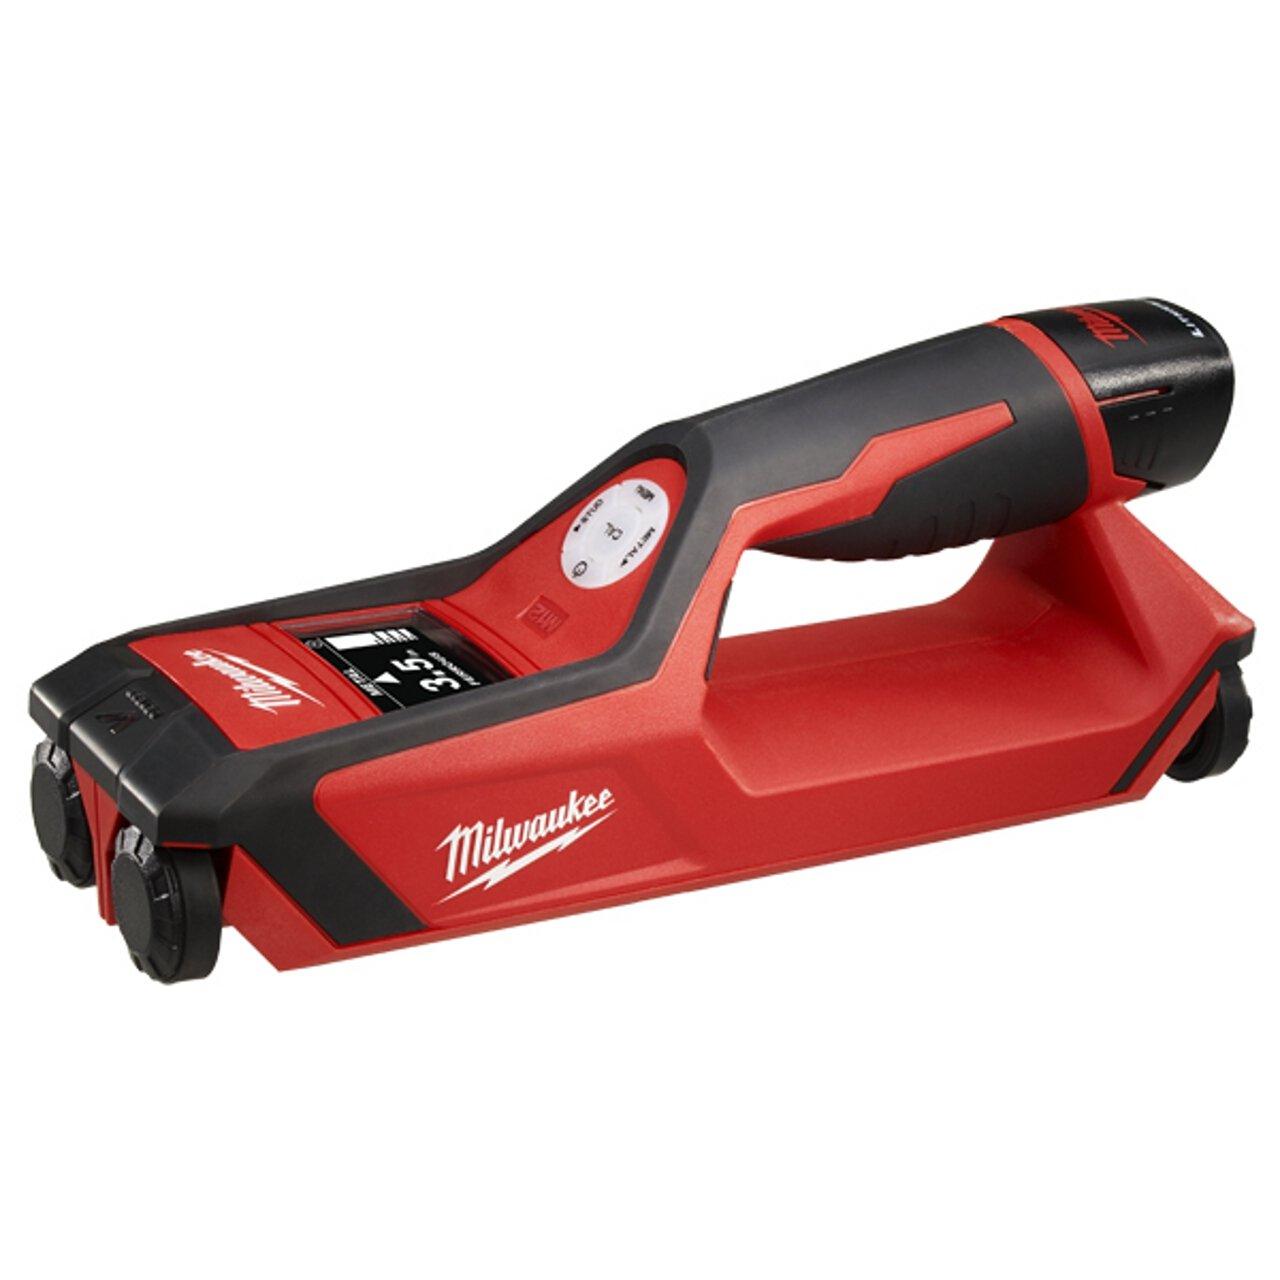 Milwaukee 2291 - 21 M12 sub-scanner Kit: Amazon.es: Bricolaje y herramientas